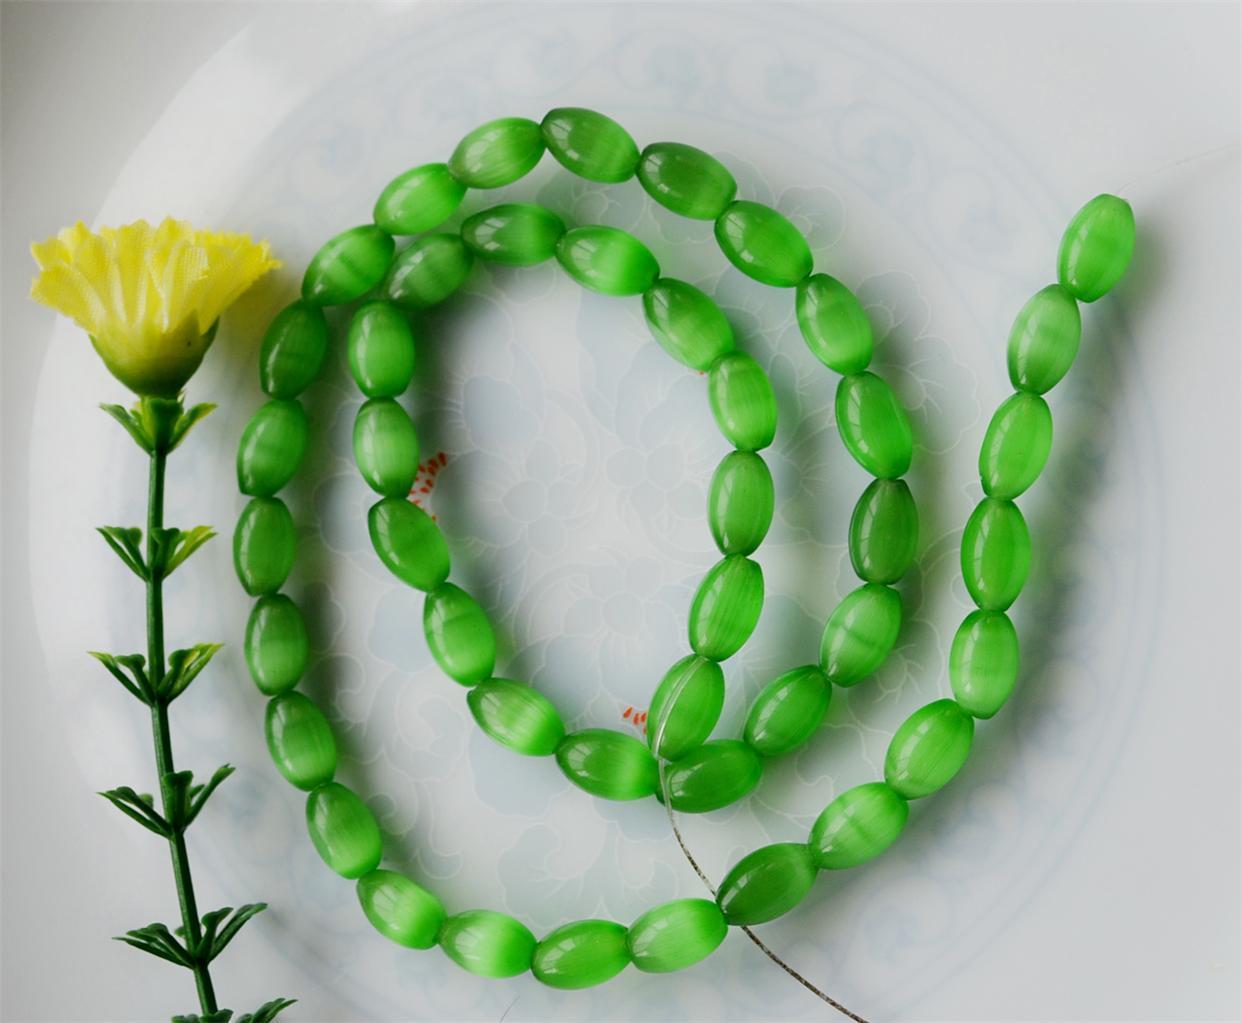 fa7b64b734e4 Encantador 8x12mm Verde mexicano peridoto piedra arroz perlas accesorios  para joyería de moda collar pulsera ED162